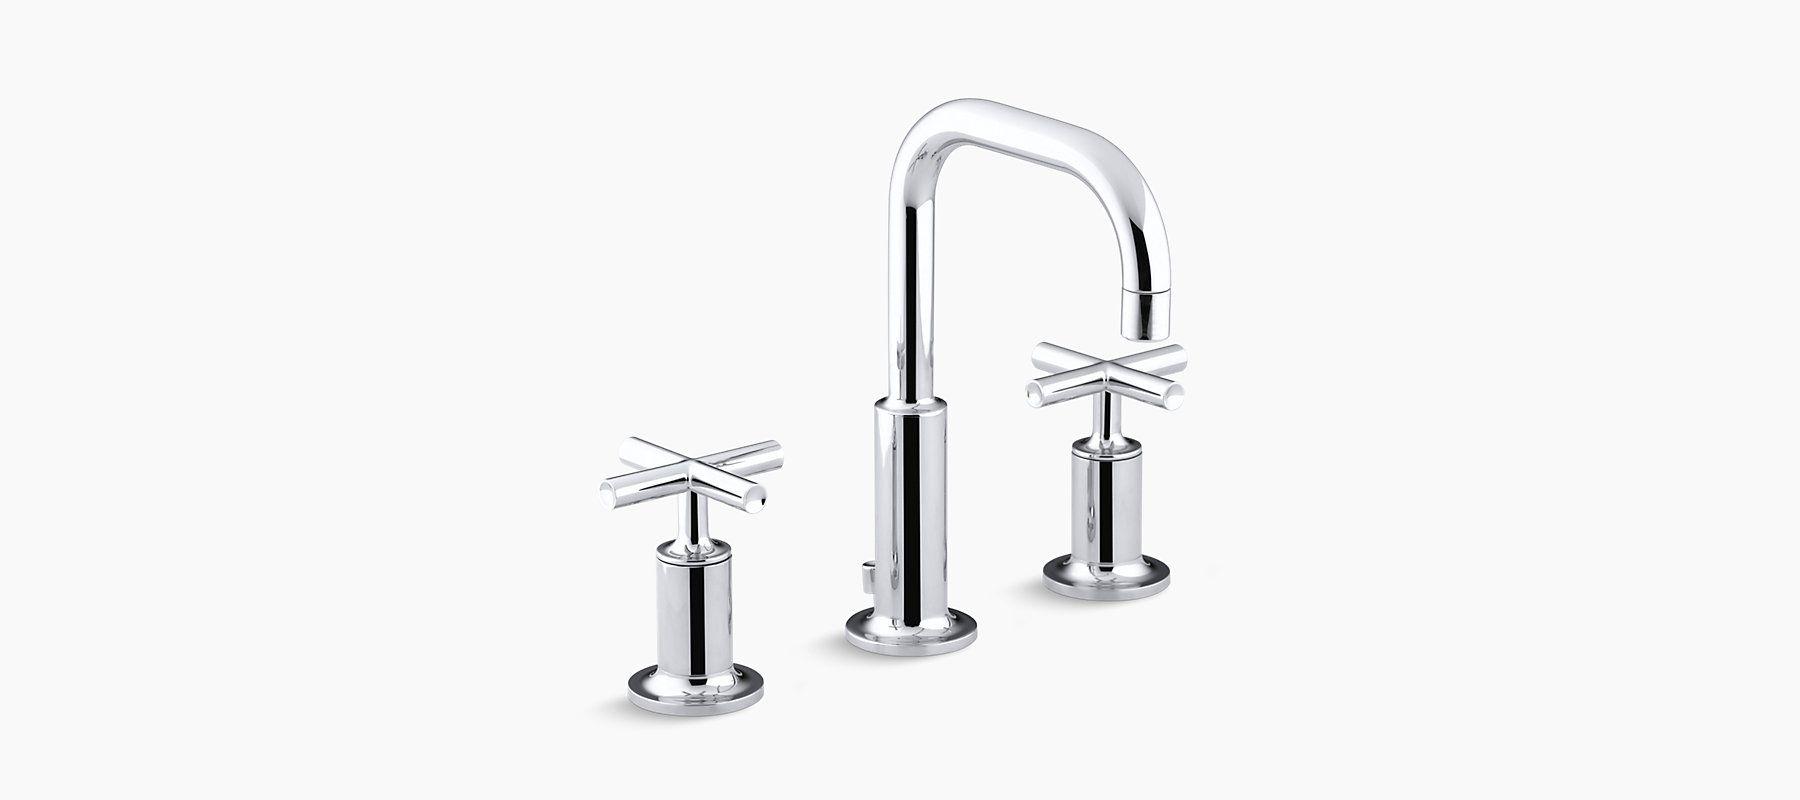 The Ada Certified K 3 Water Saving Sink Faucet Has A